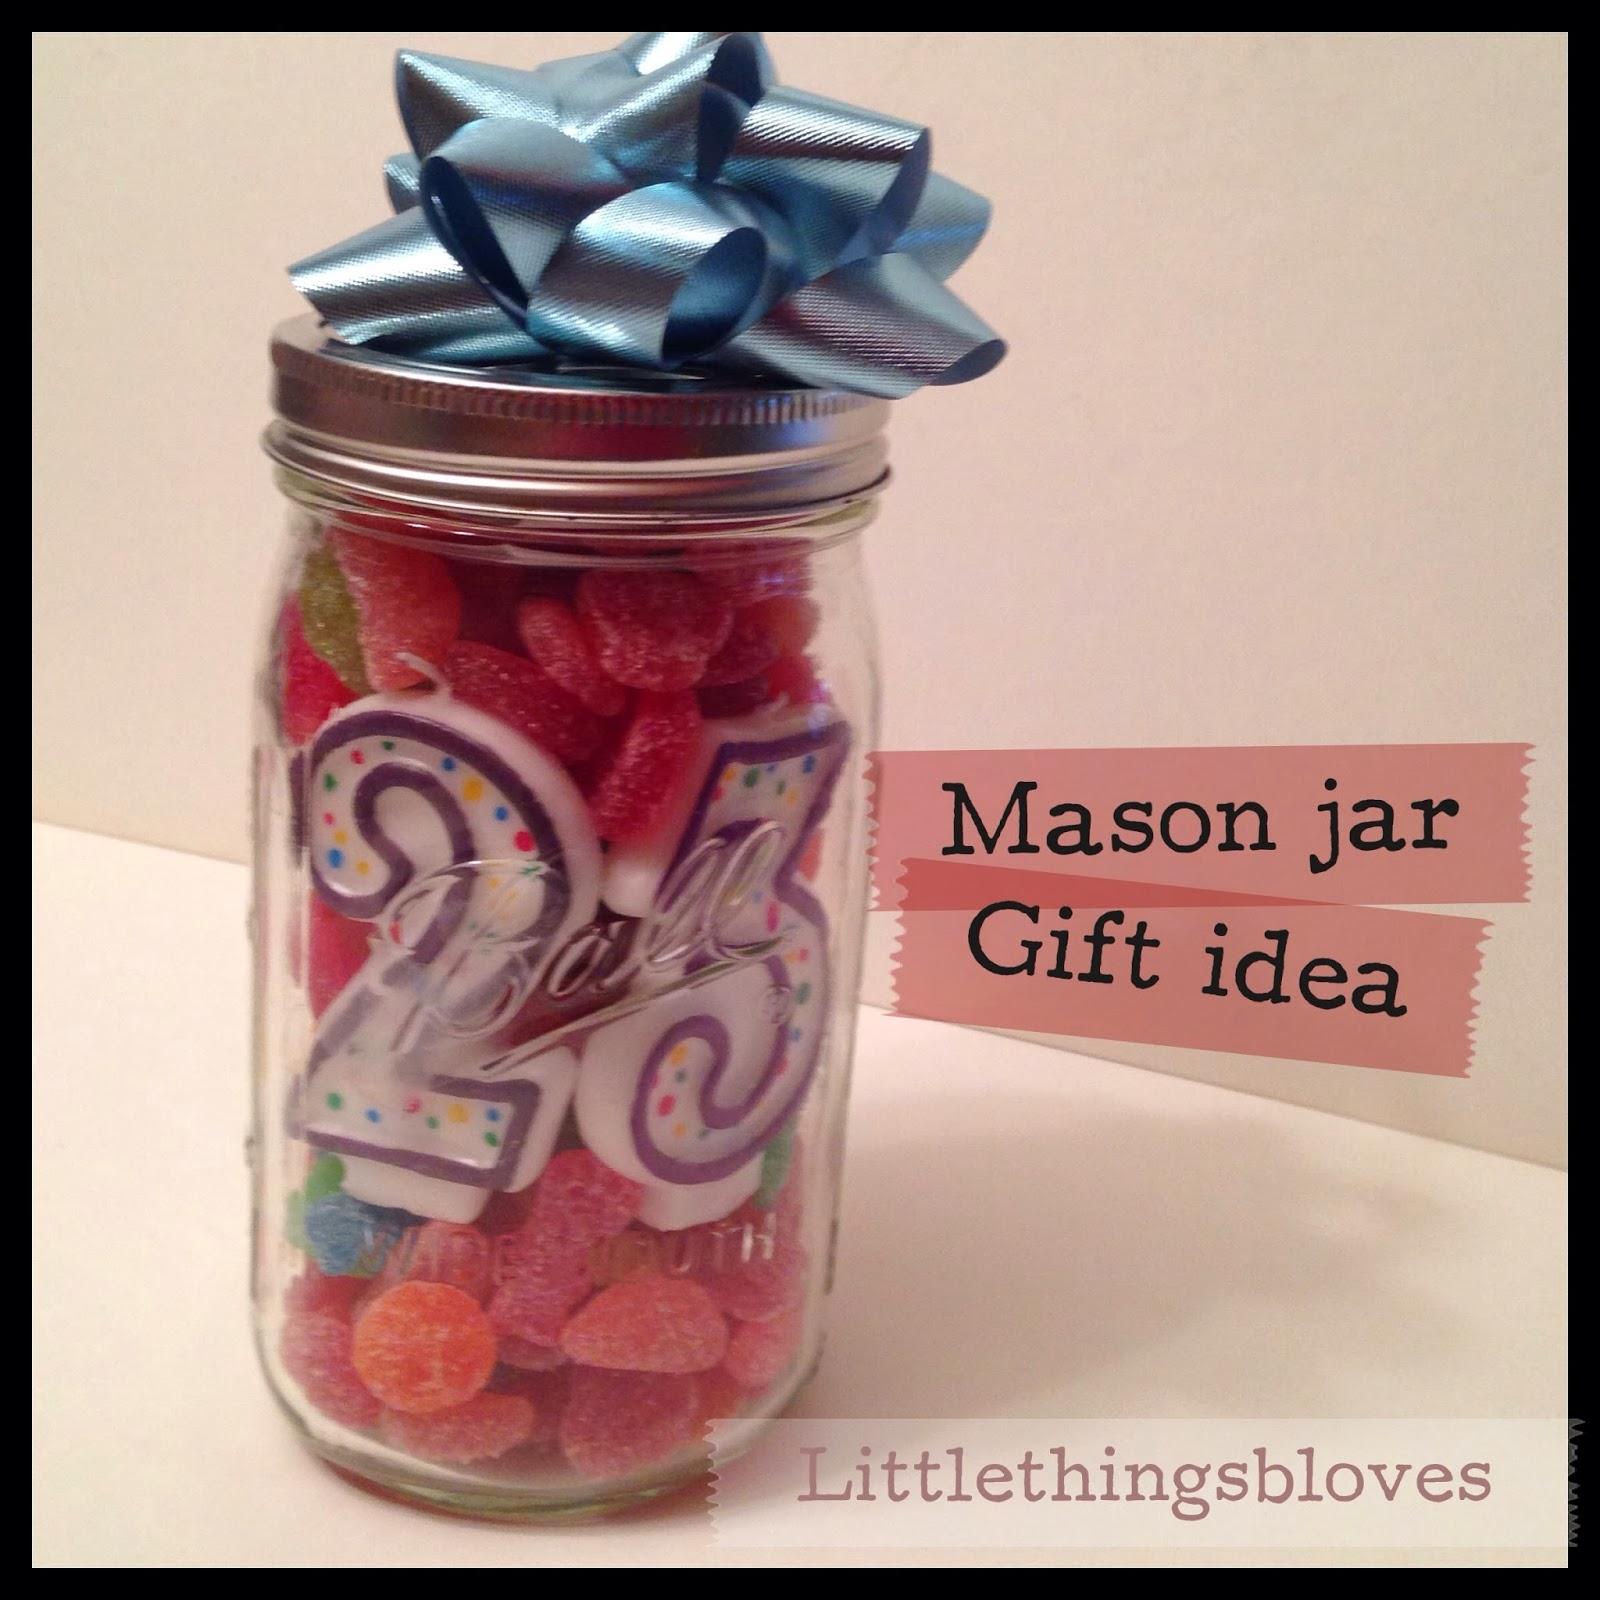 23 Gifts For My Boyfriend S 23rd Birthday: She's Wright : Mason Jar Fun